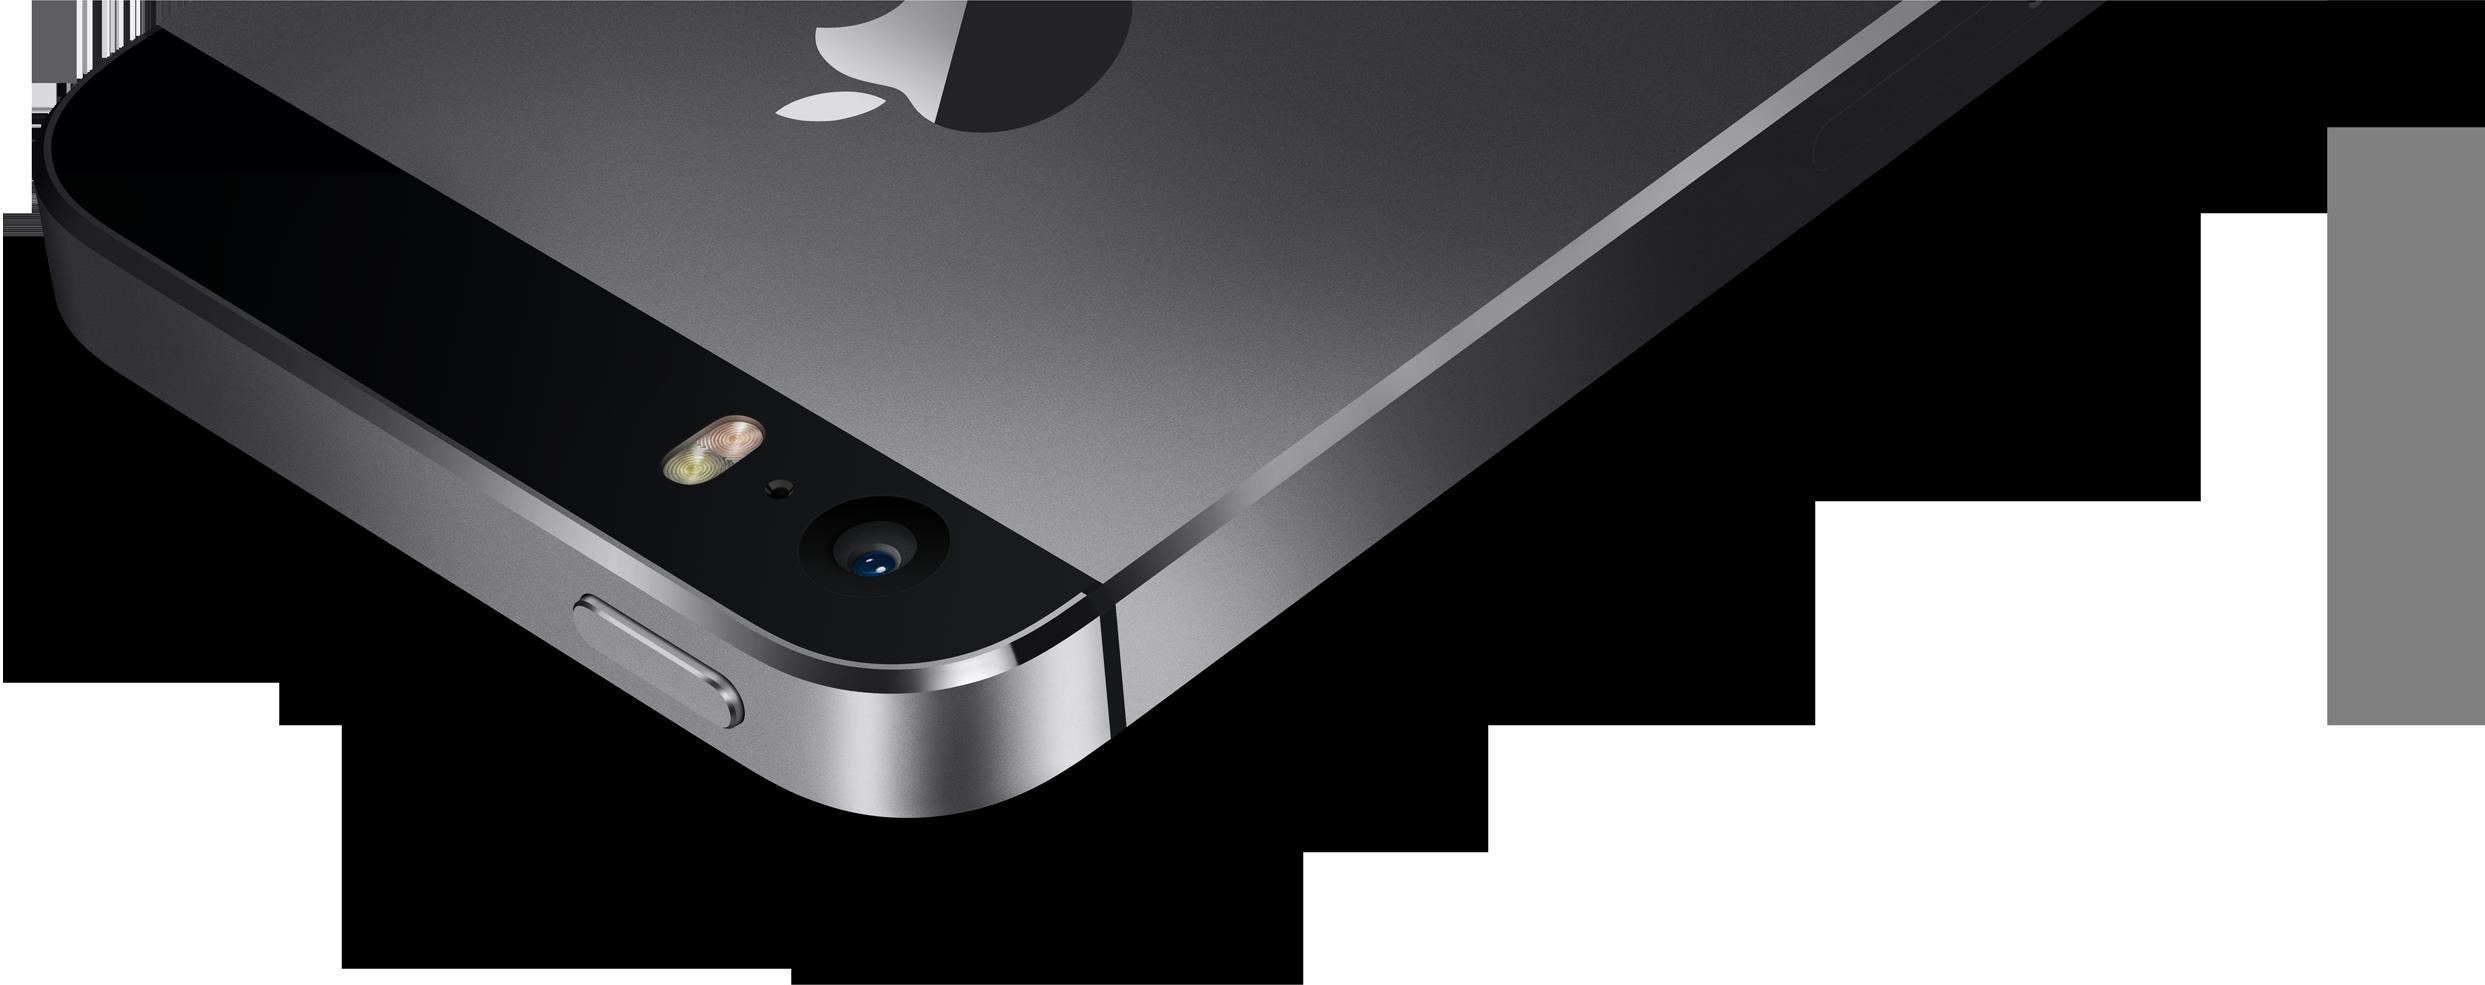 iPhone 5s Black